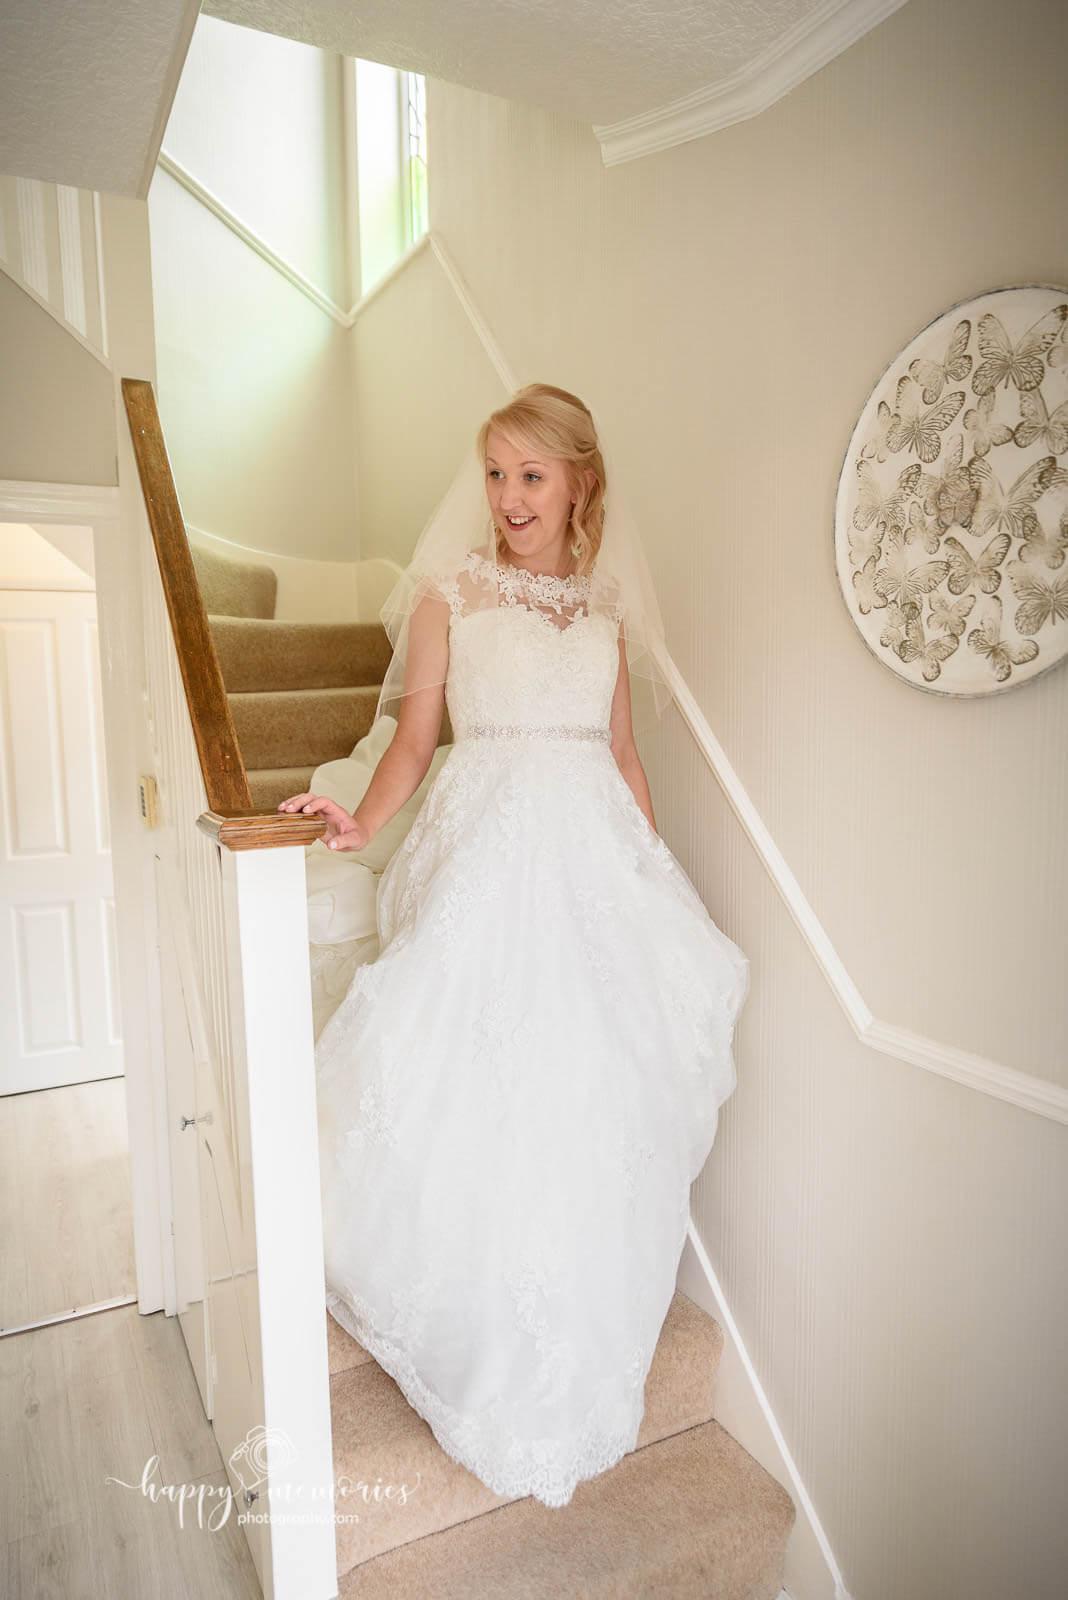 Wedding photographer East Grinstead-21